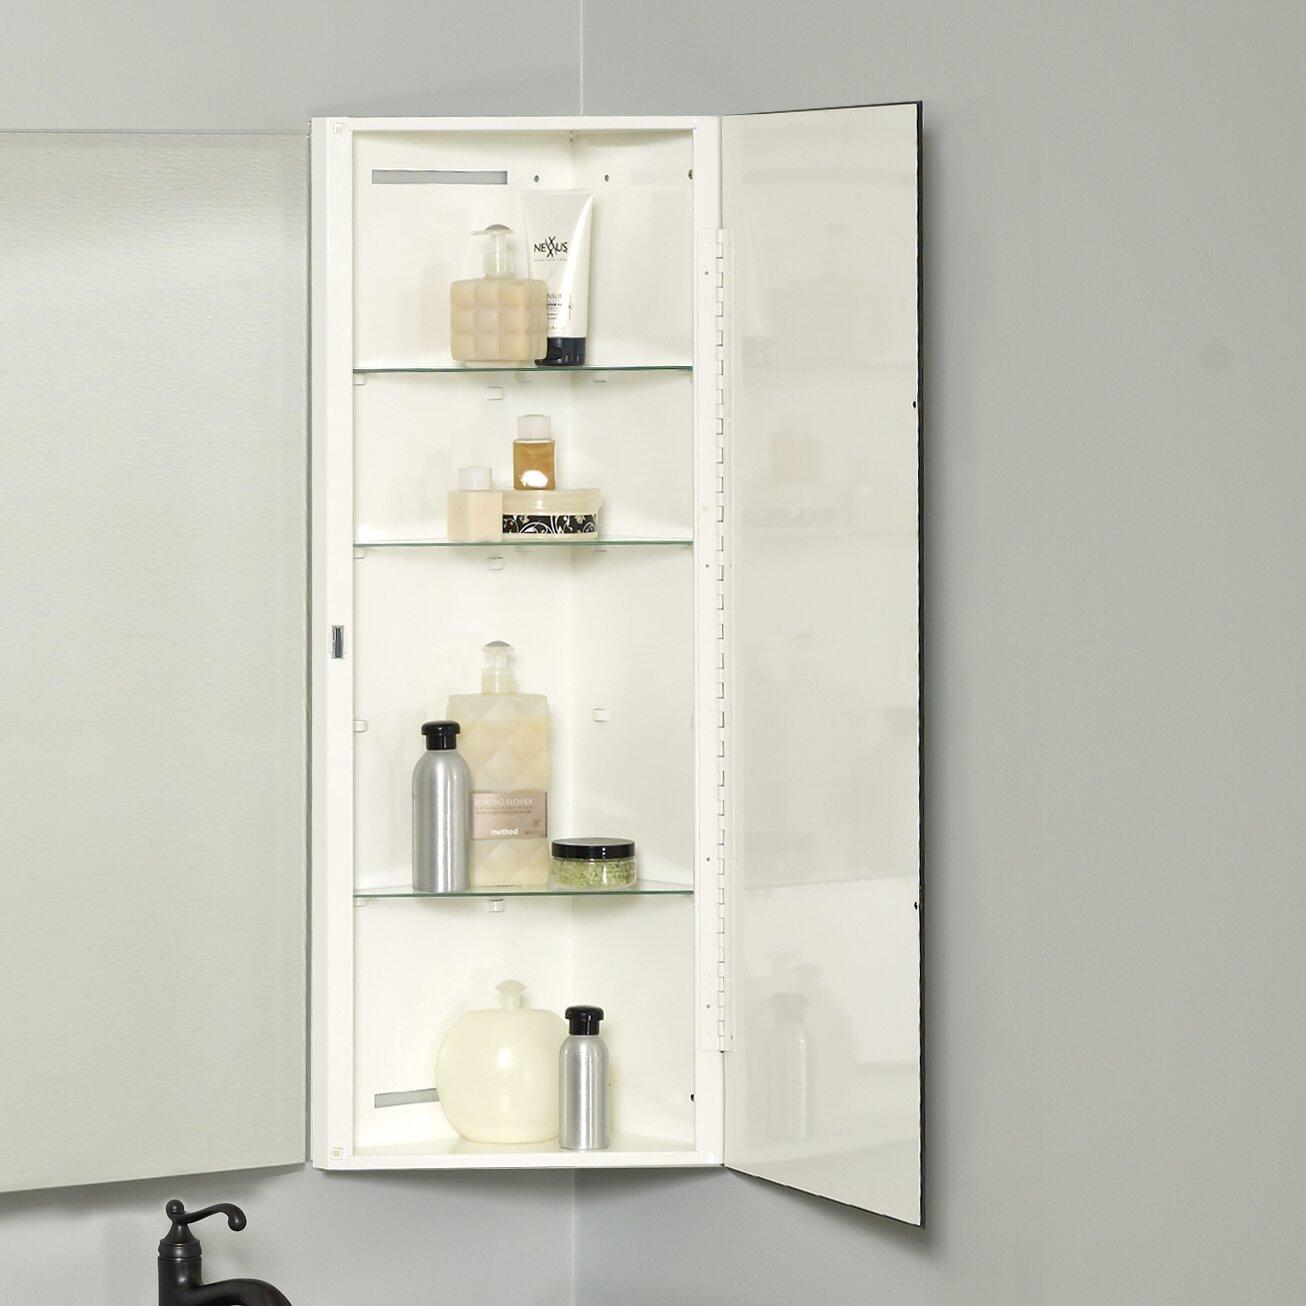 Zenith x 36 corner mount beveled edge medicine Corner medicine cabinet